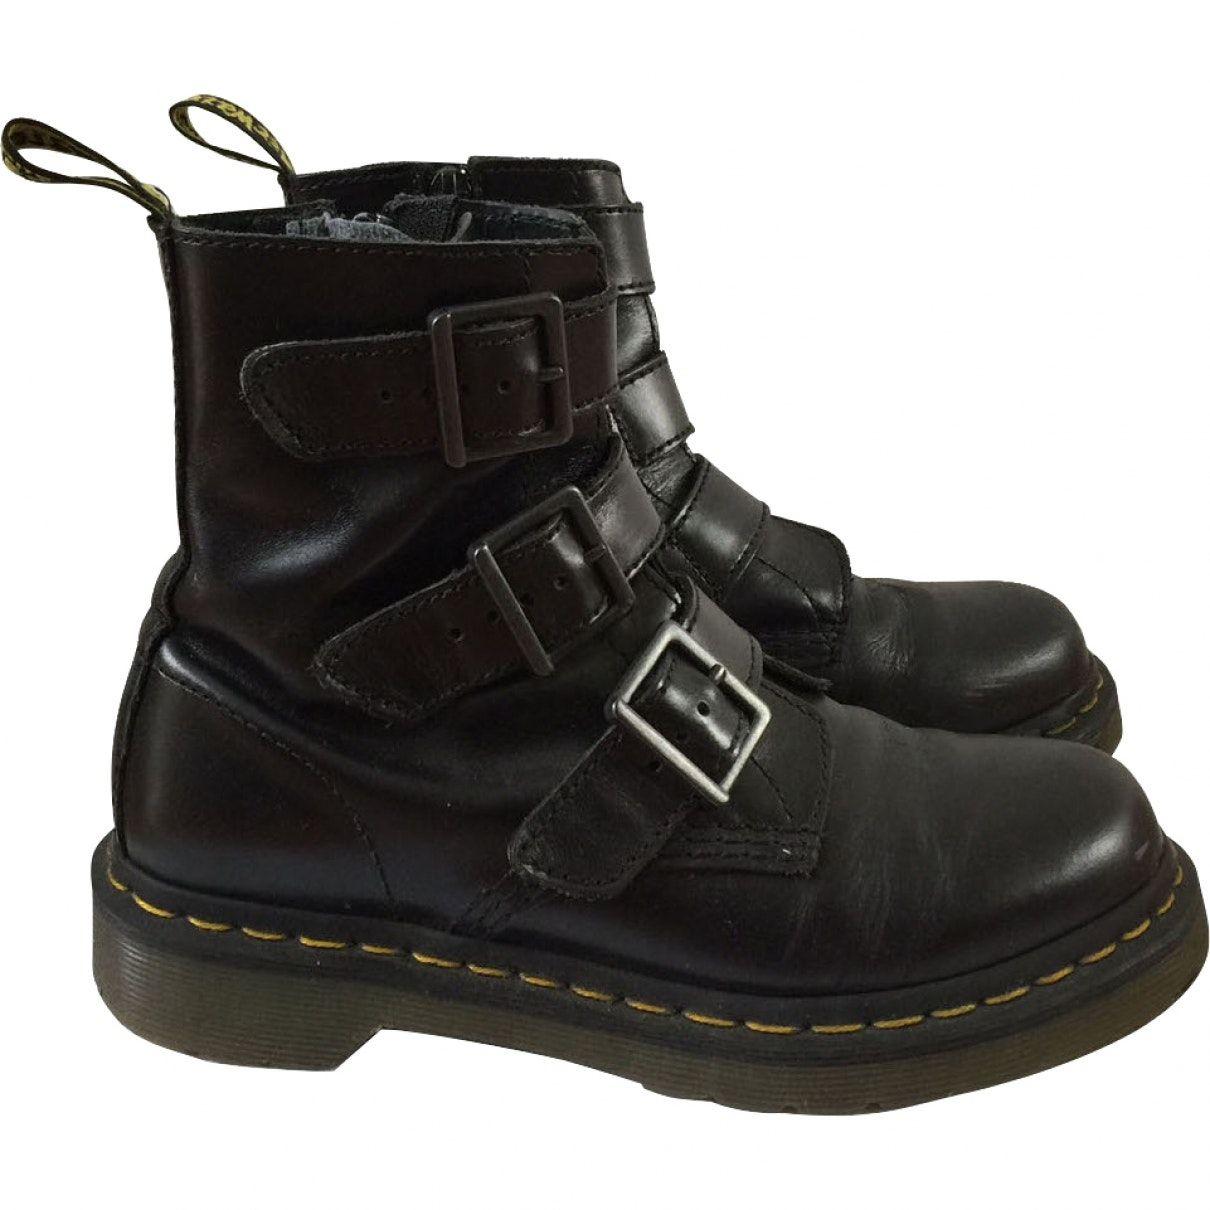 Leather buckled boots   Inspiration tenu   Pinterest   Dr martens ... ba74bcadbf49